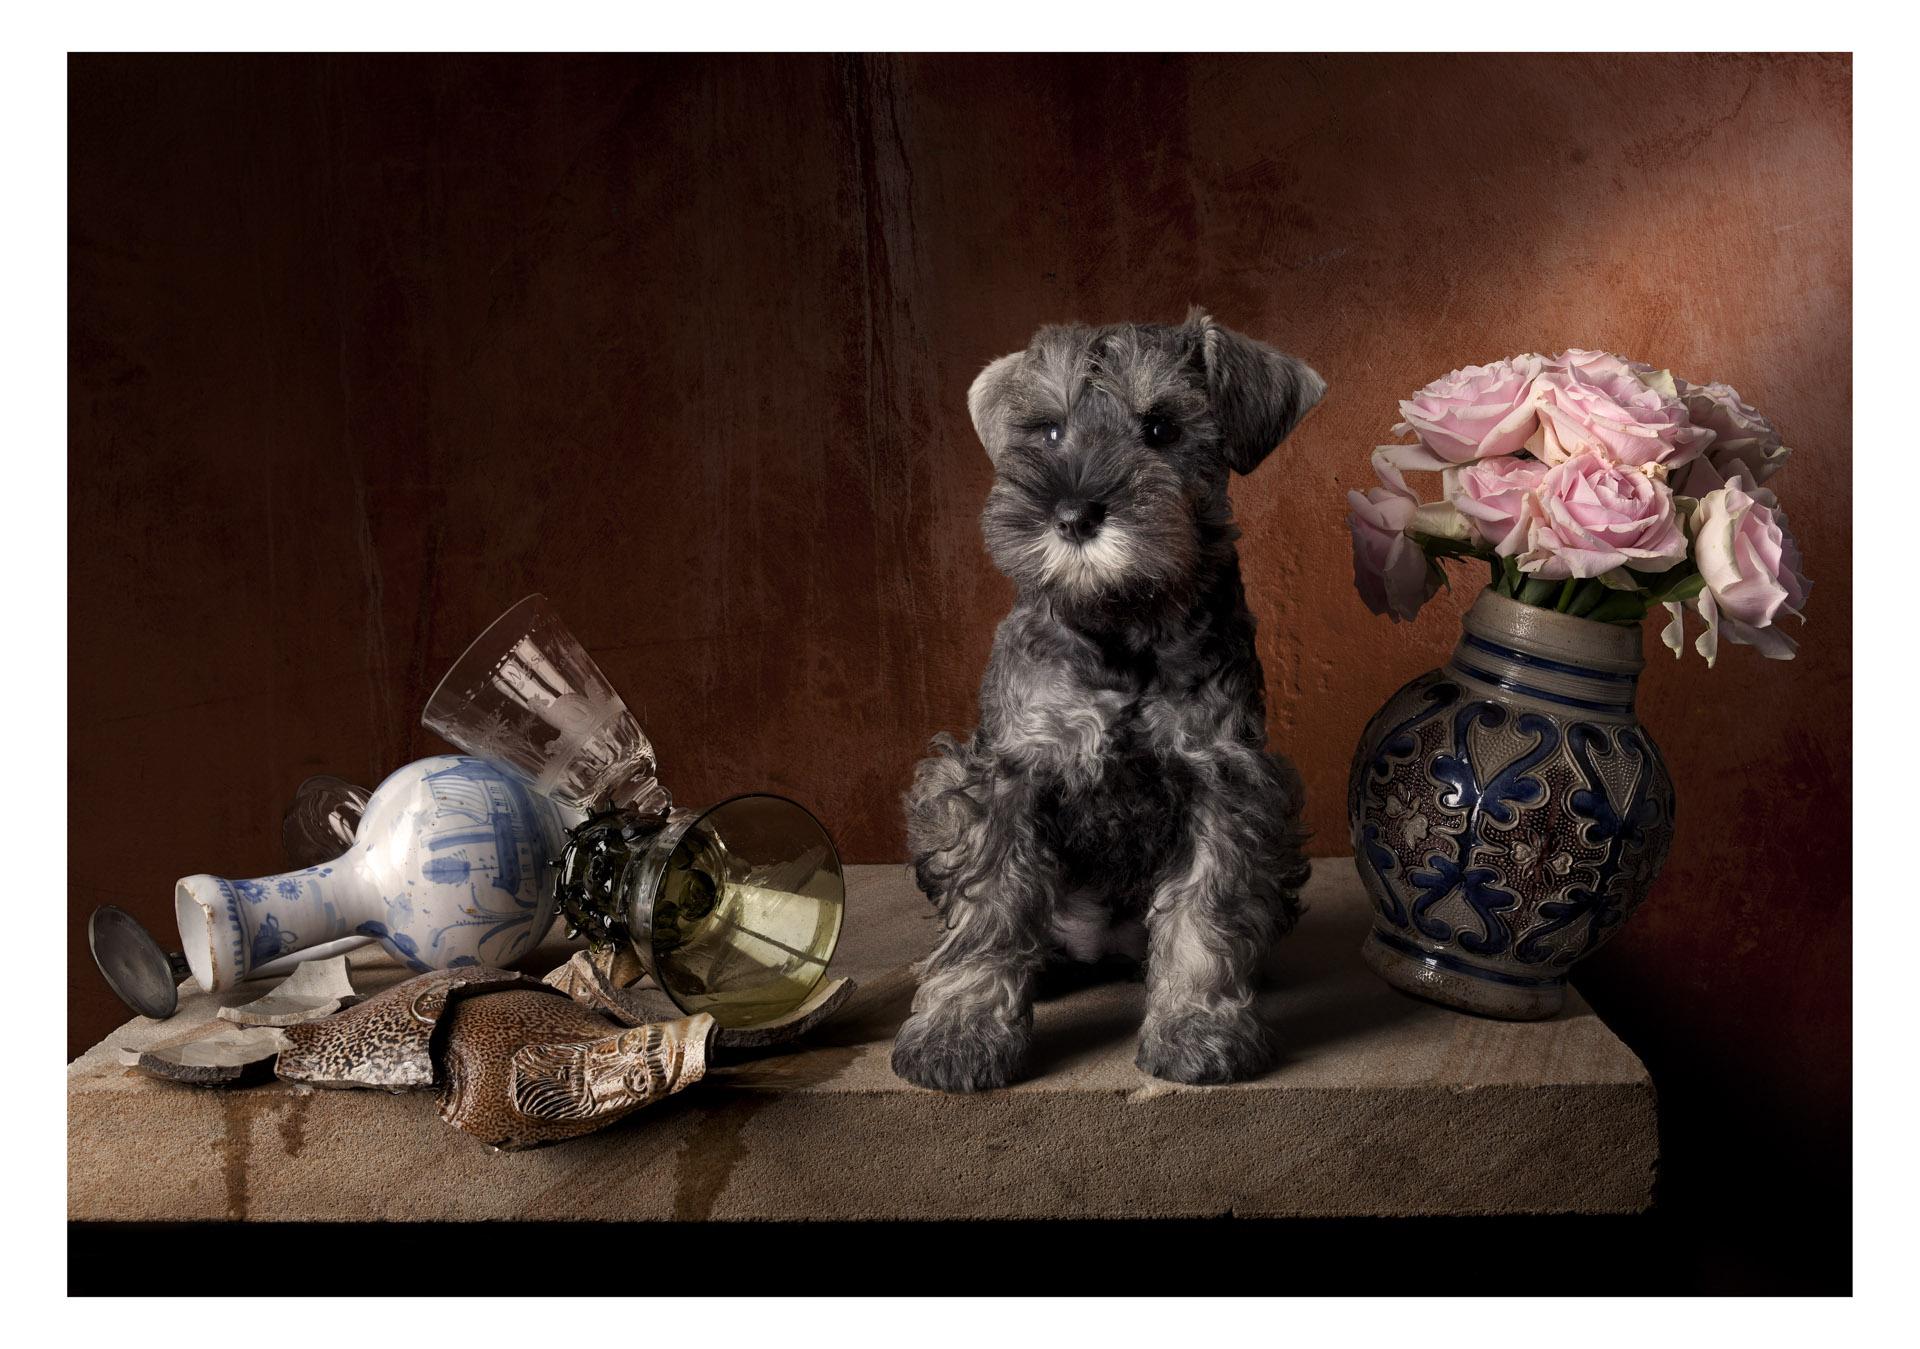 Still life with puppy